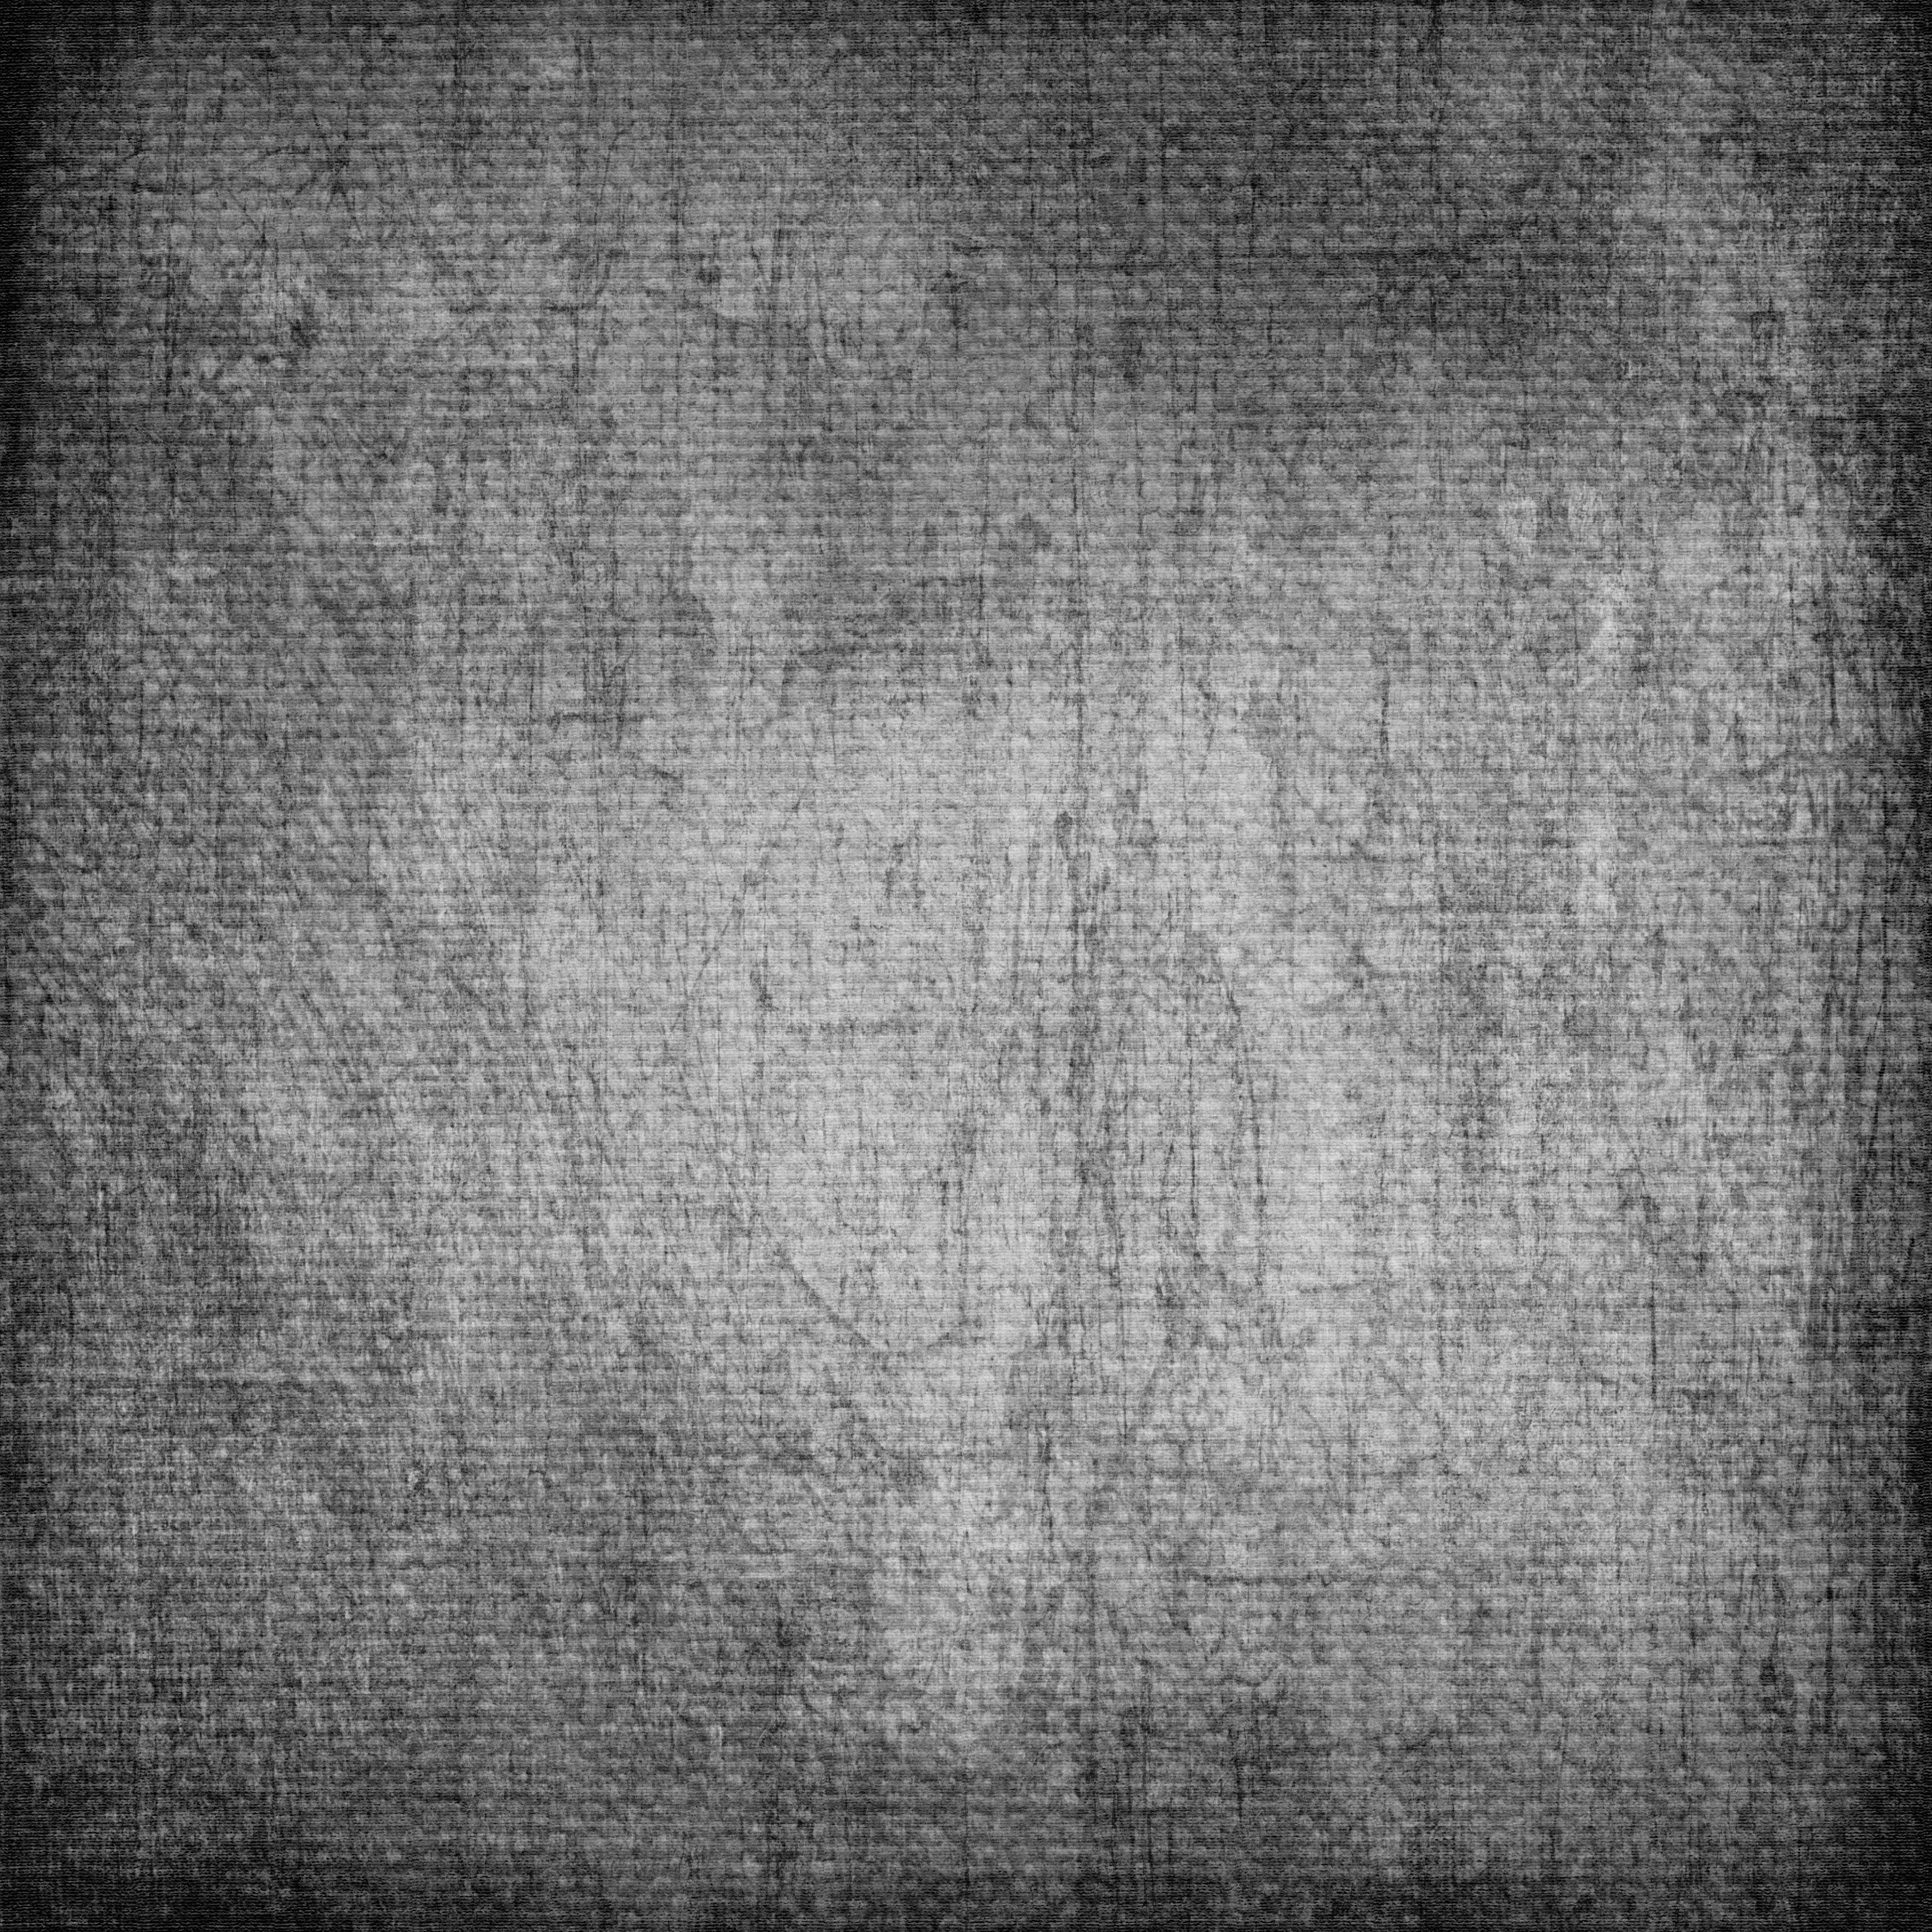 Free Grunge Textures | grunge texture overlay 2 by ...